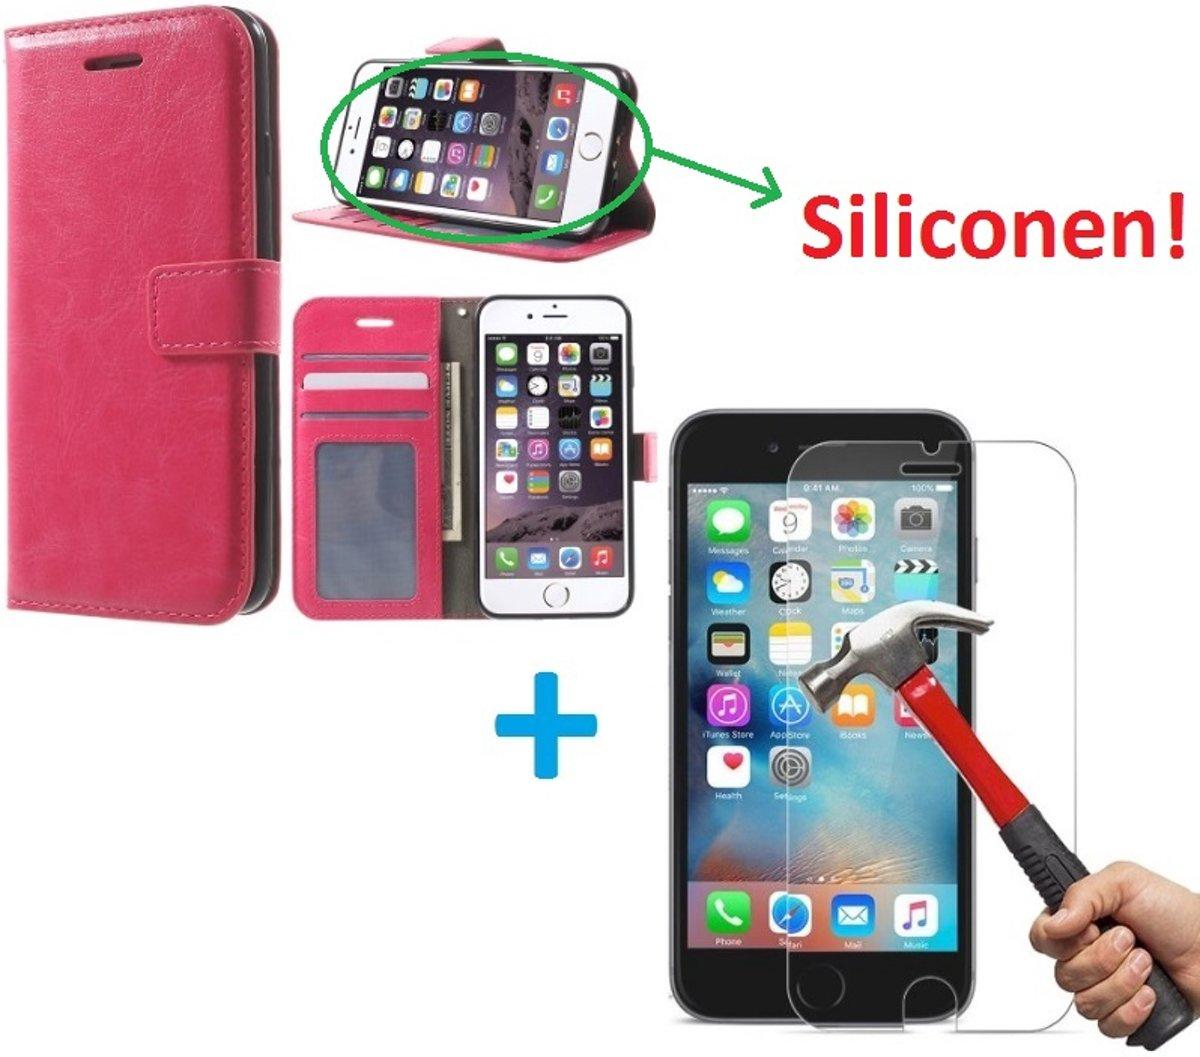 iPhone 5 5S Portemonnee hoes roze met Tempered Glas Screen protector